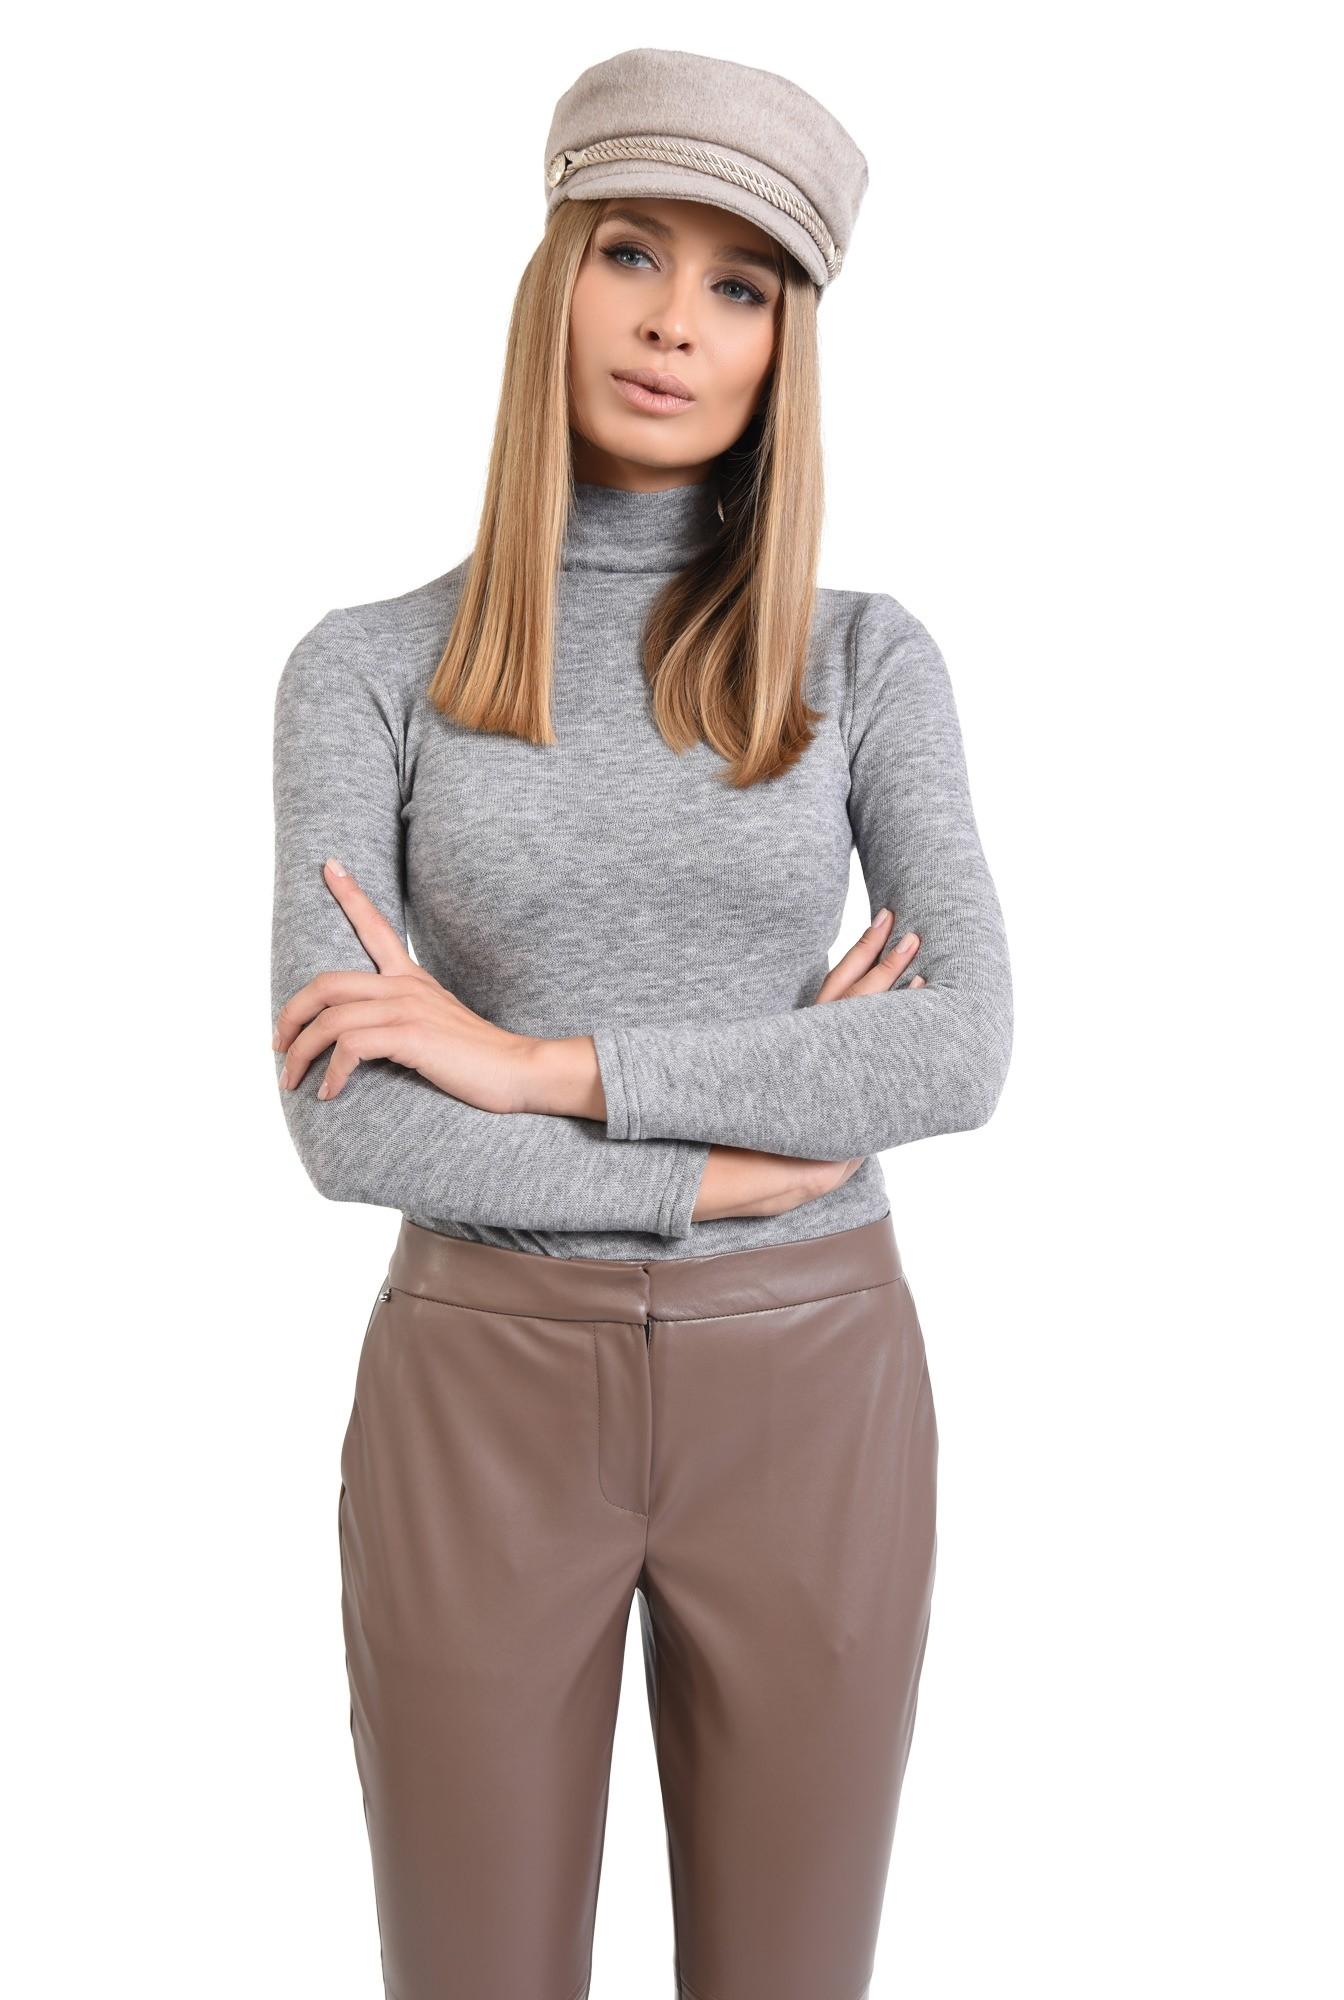 0 - pantaloni casual, pana, piele eco, talie medie